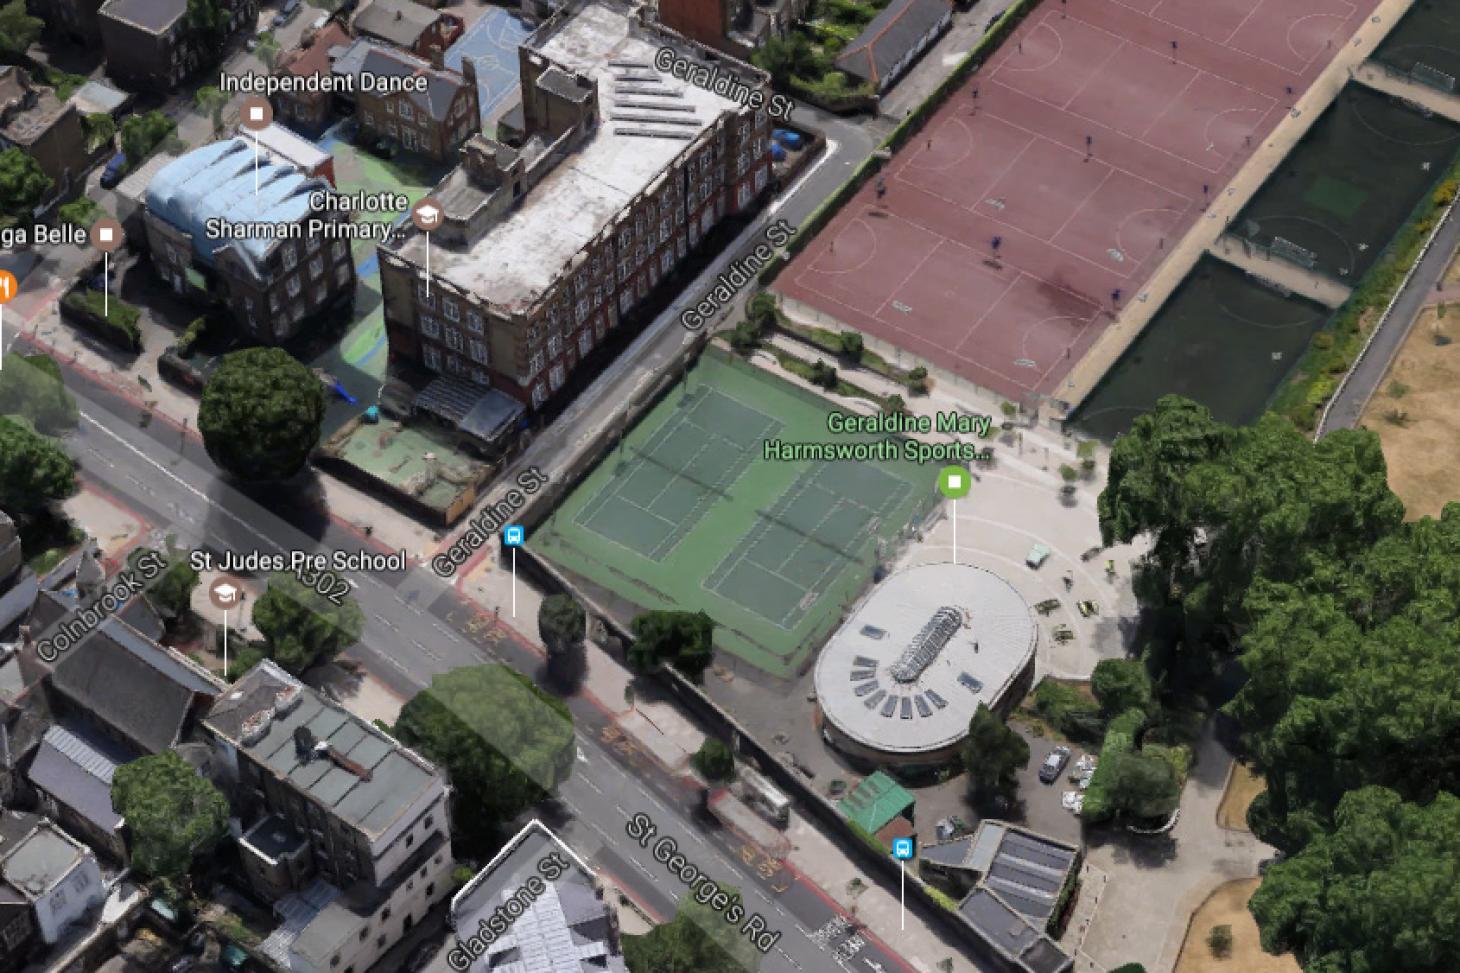 Geraldine Mary Harmsworth Sports Facility Outdoor   Hard (macadam) tennis court